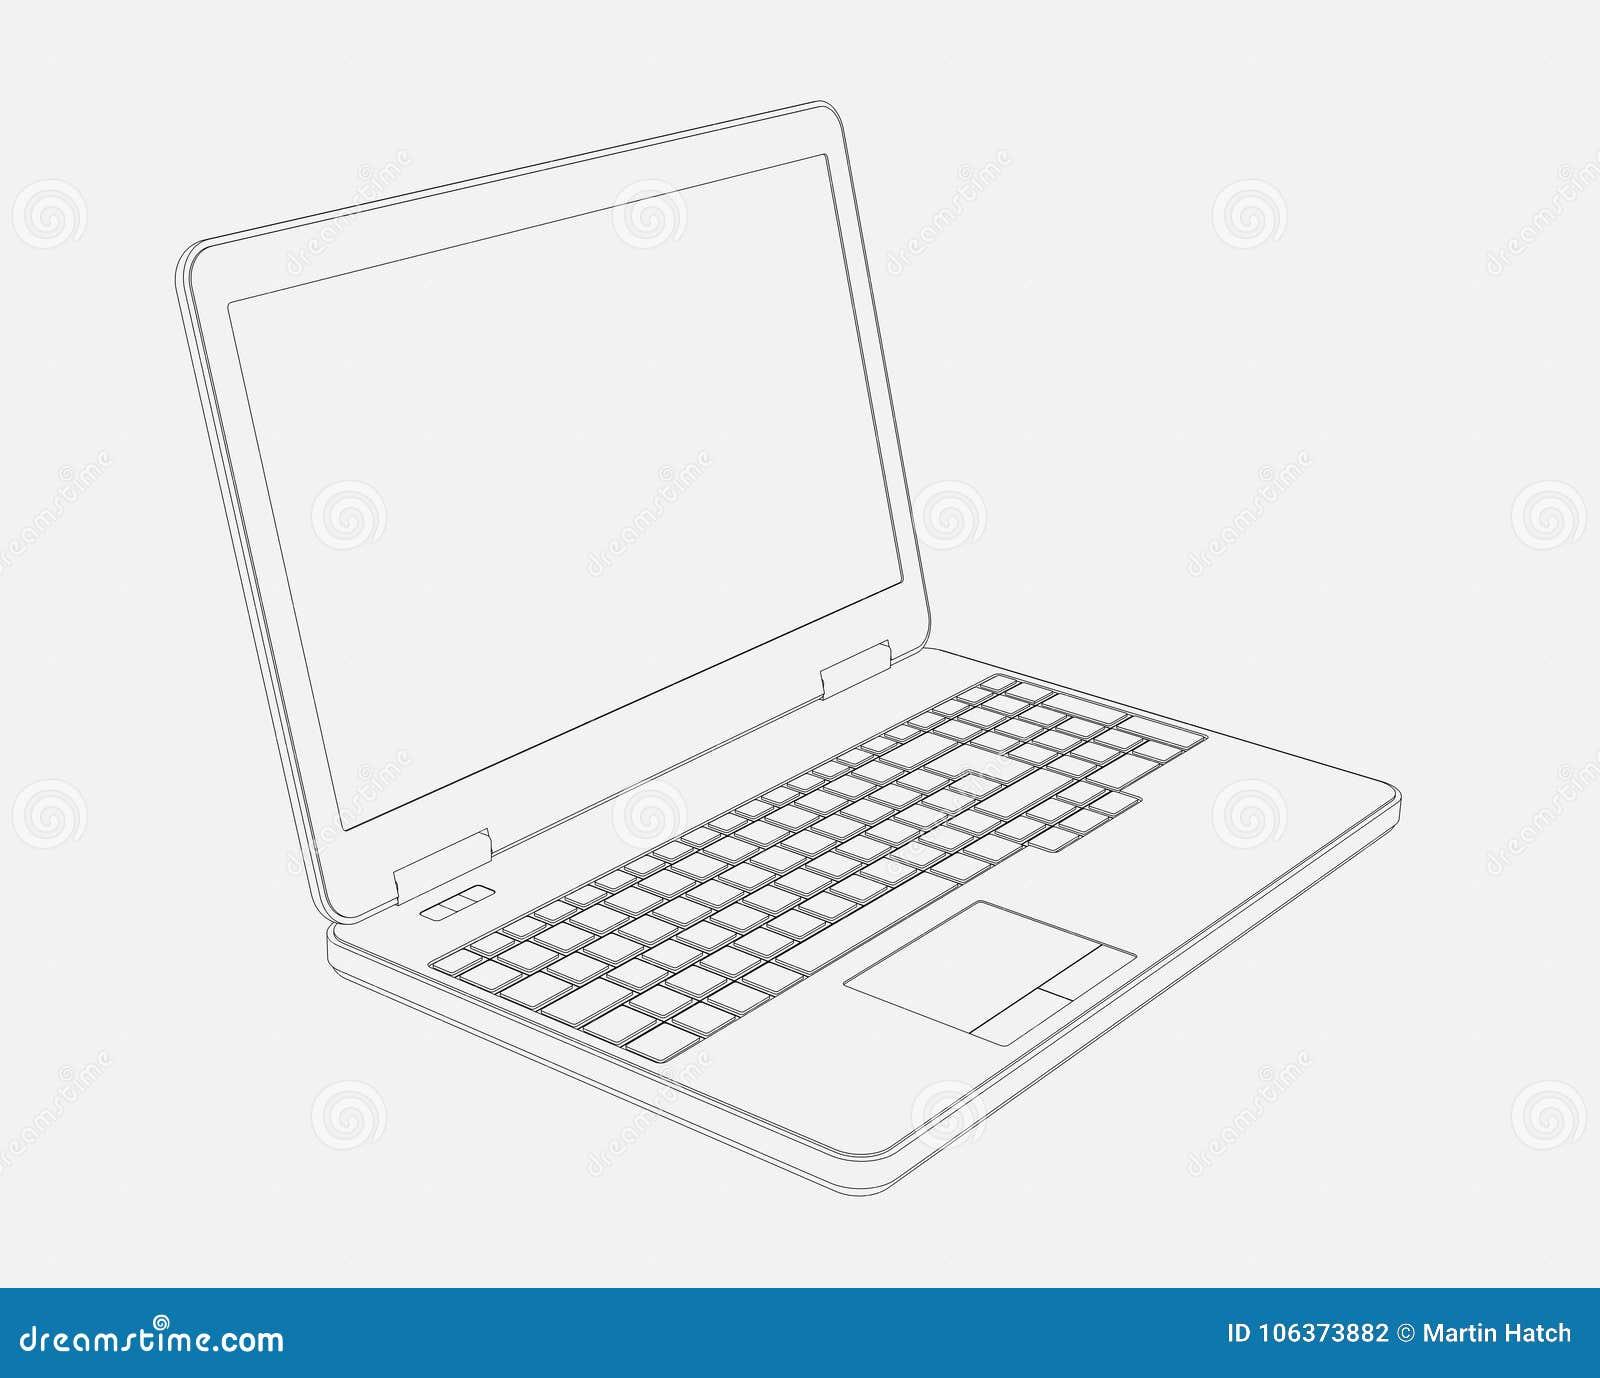 Dessin 3d D Ordinateur Portable Illustration Stock Illustration Du